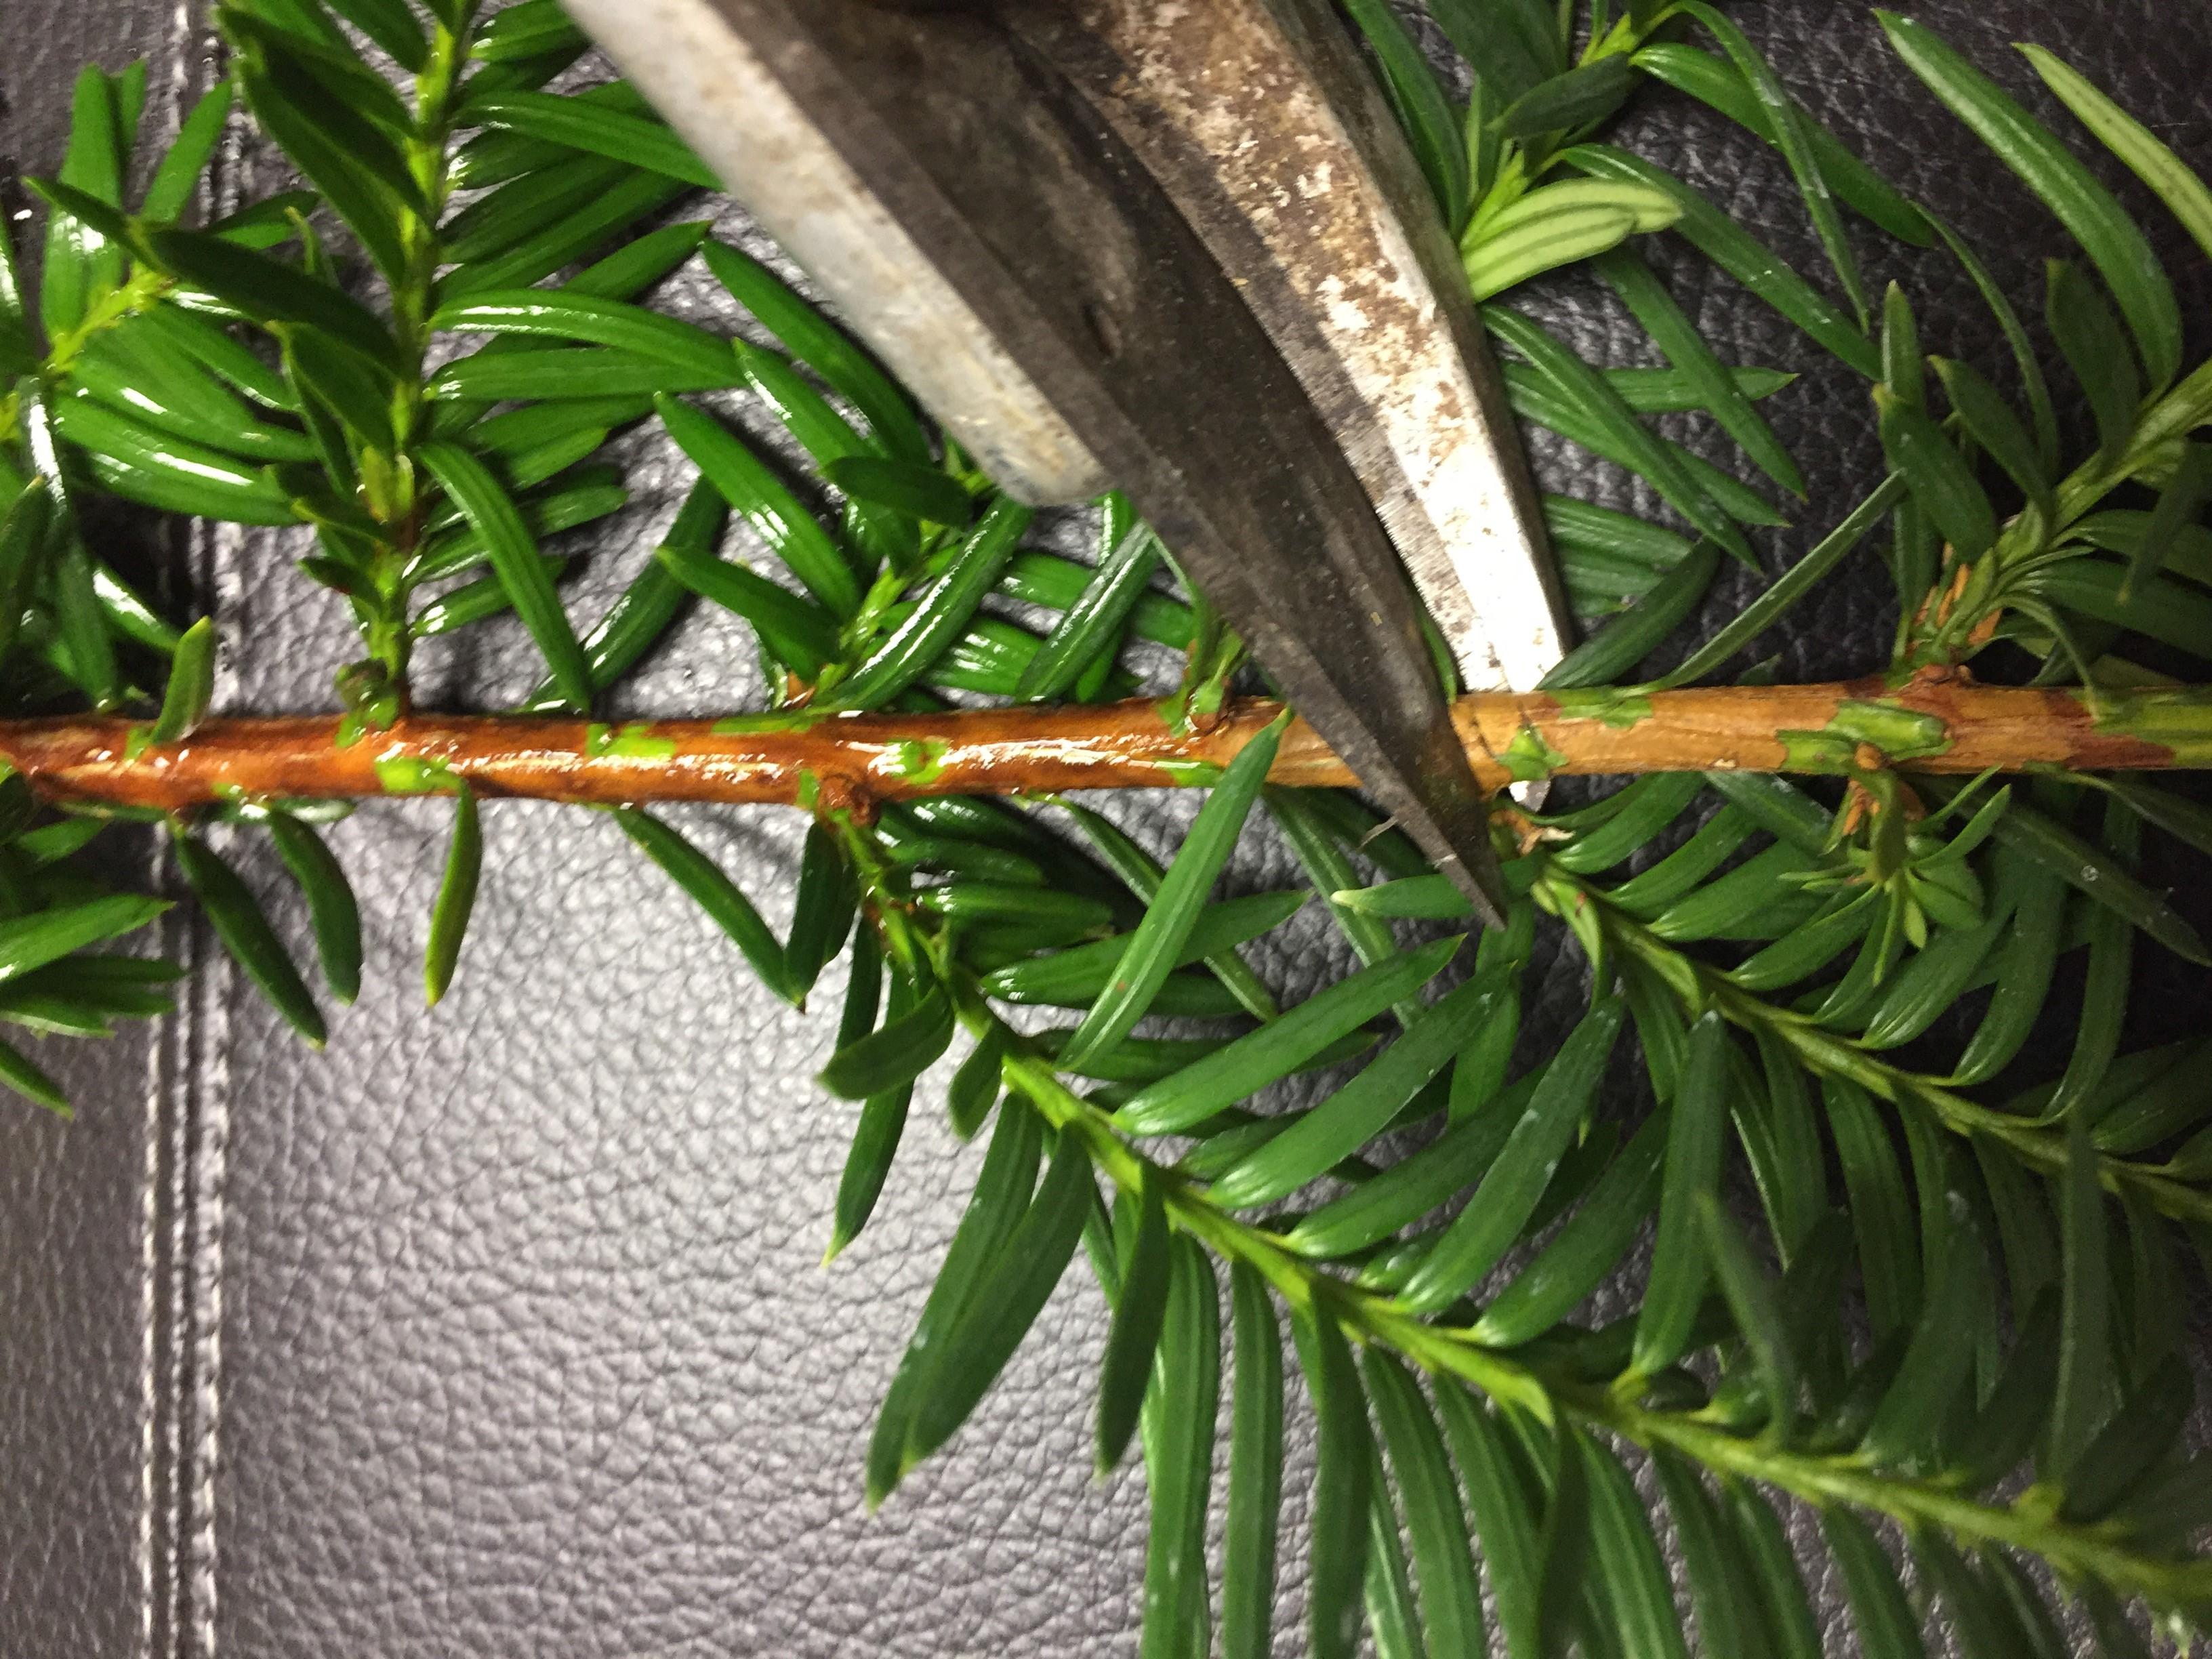 Pruning yew